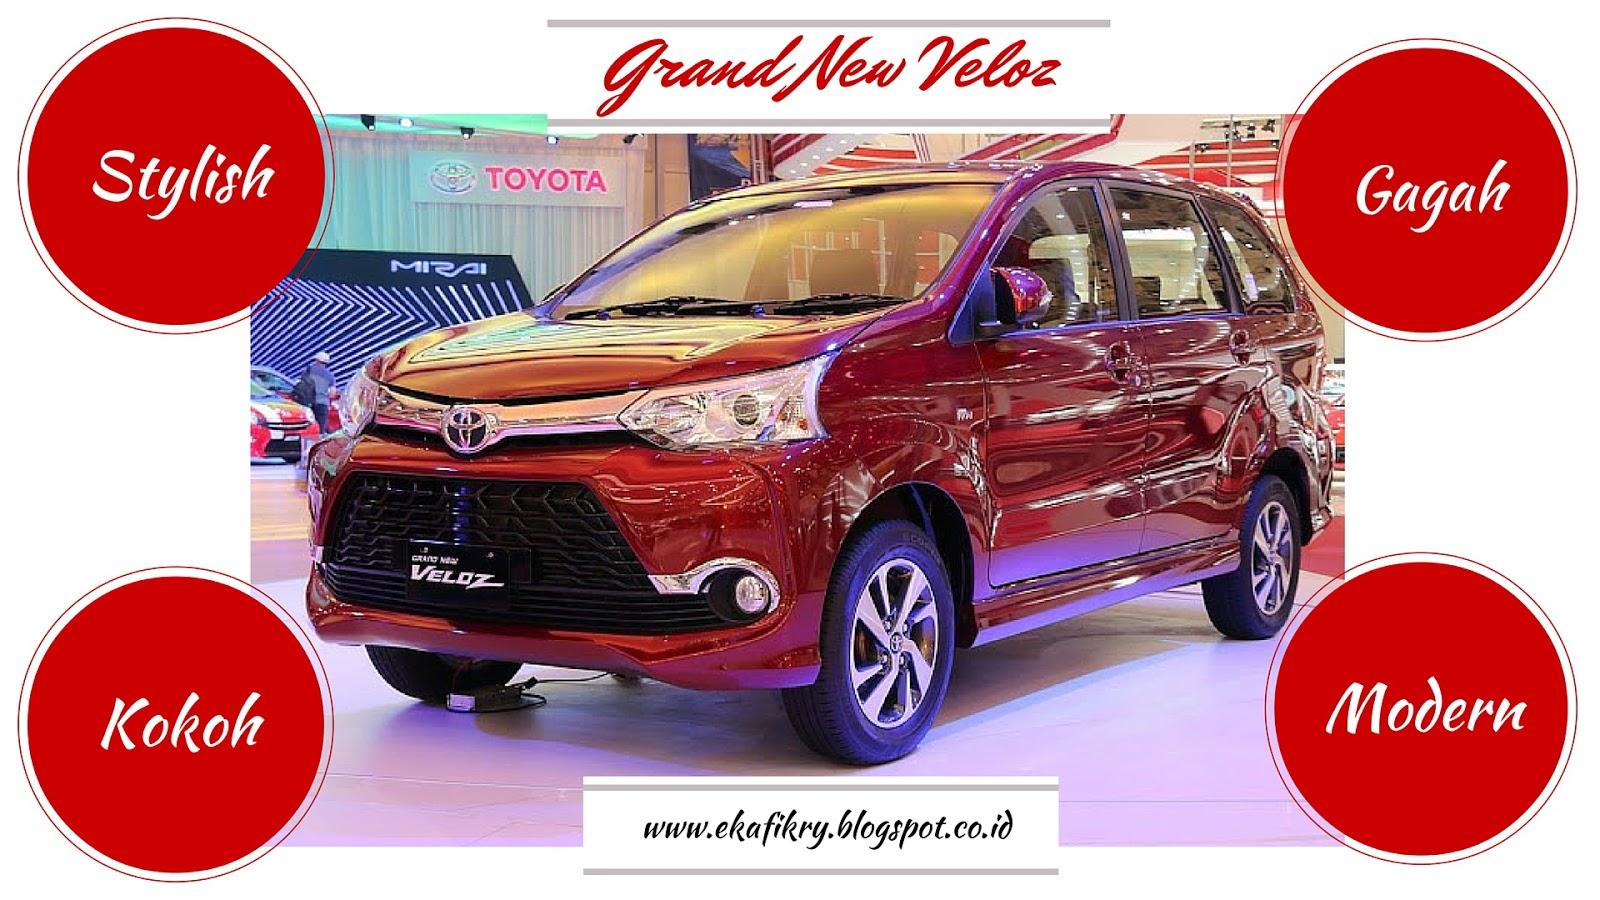 Buku Manual Grand New Veloz Toyota Yaris Trd Sportivo Harga The Shymphony Of Eka Dan Avanza